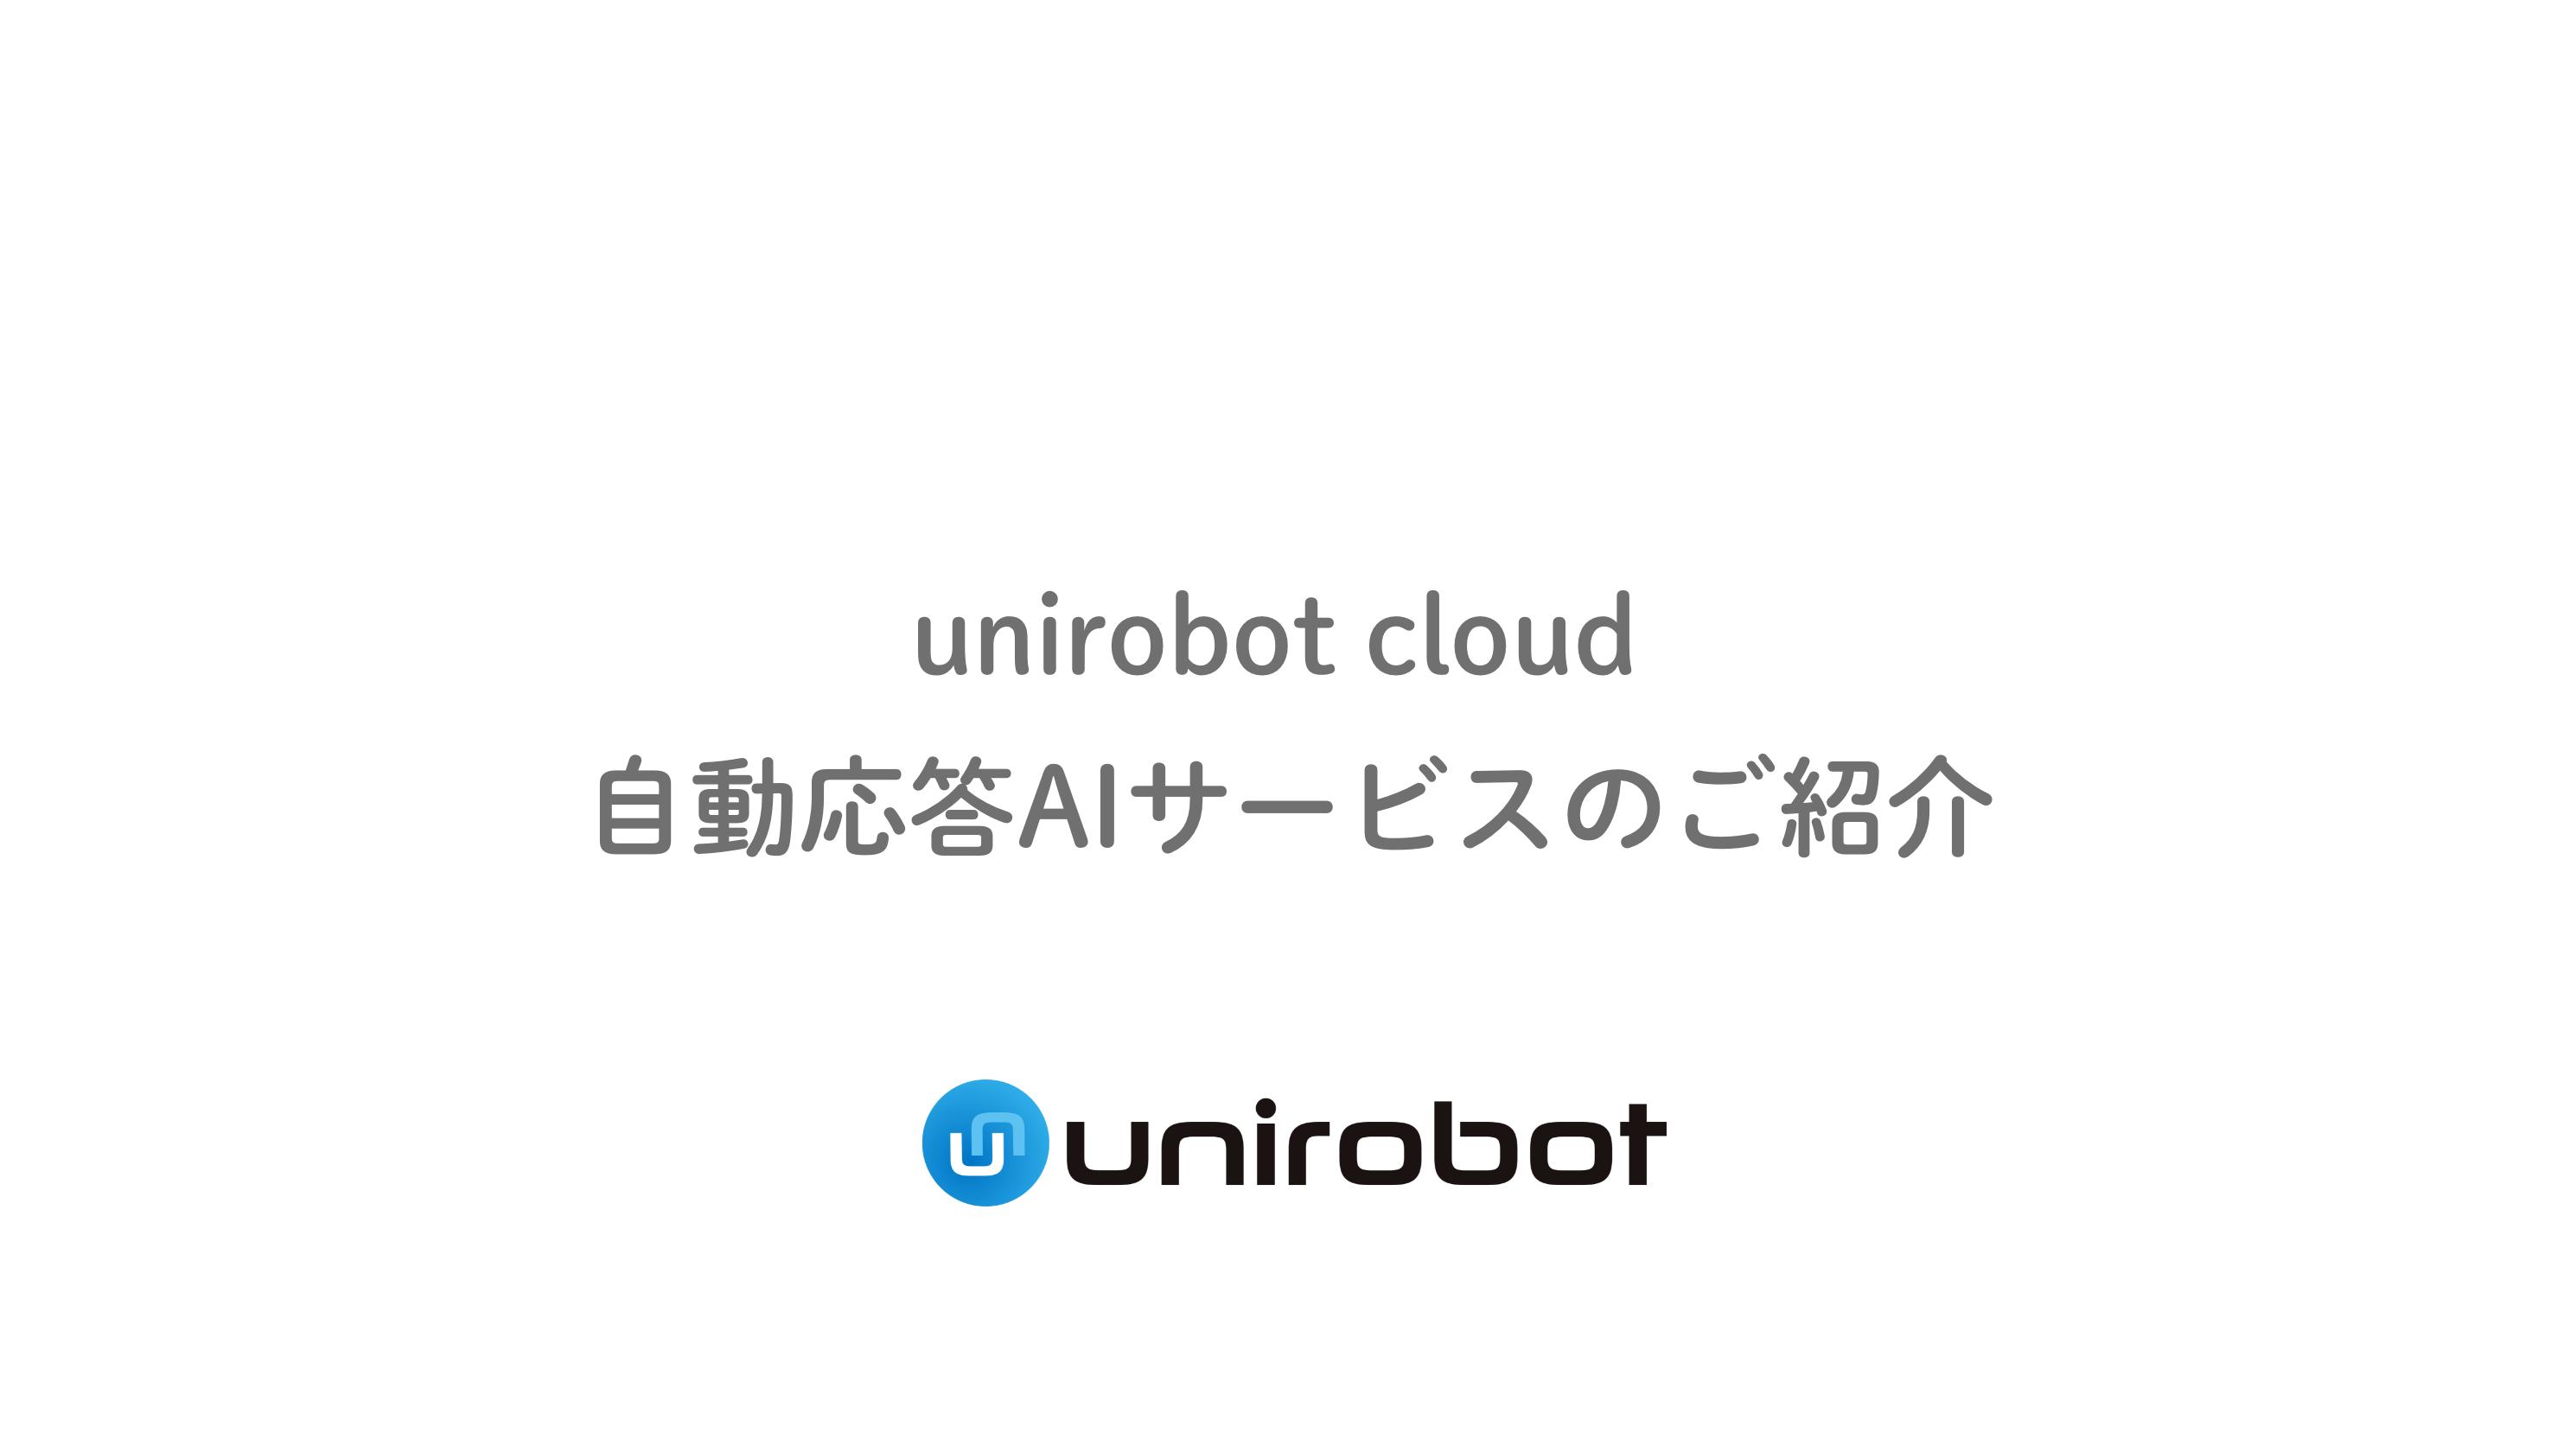 unirobot-cloud,自動応答AIサービス